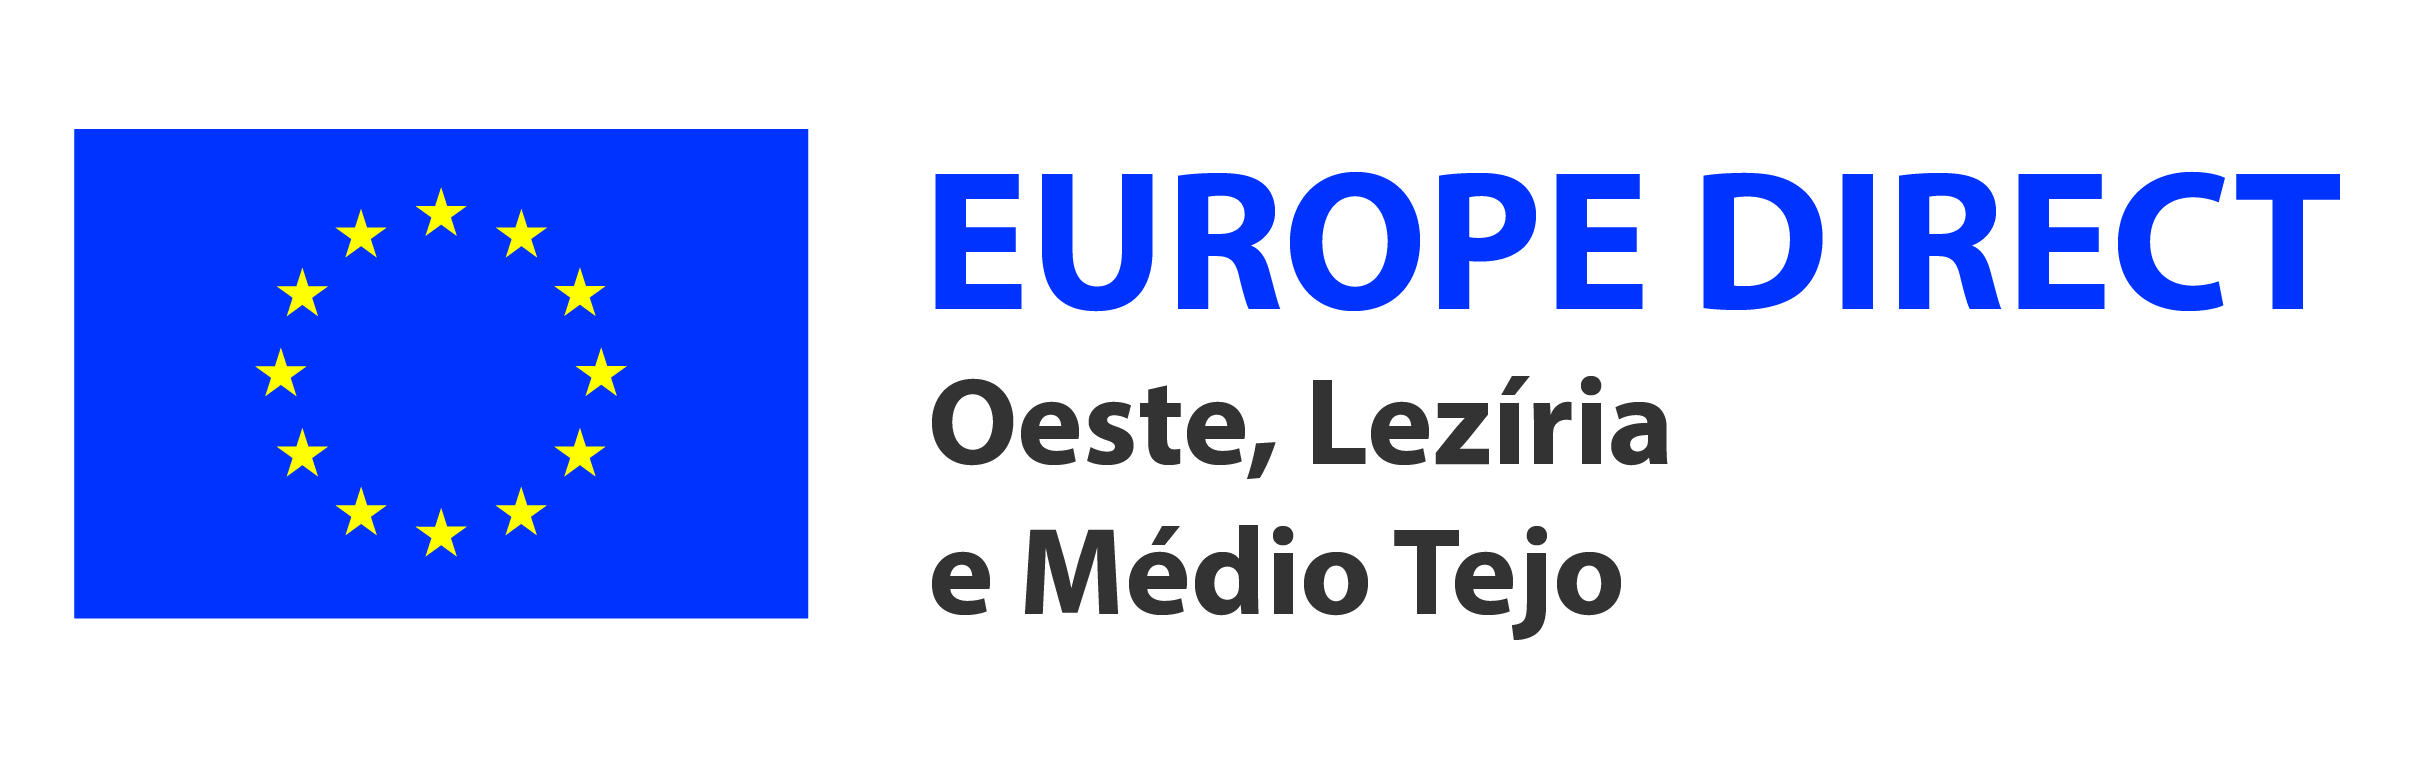 Europe Direct Oeste, Lezíria e Médio Tejo